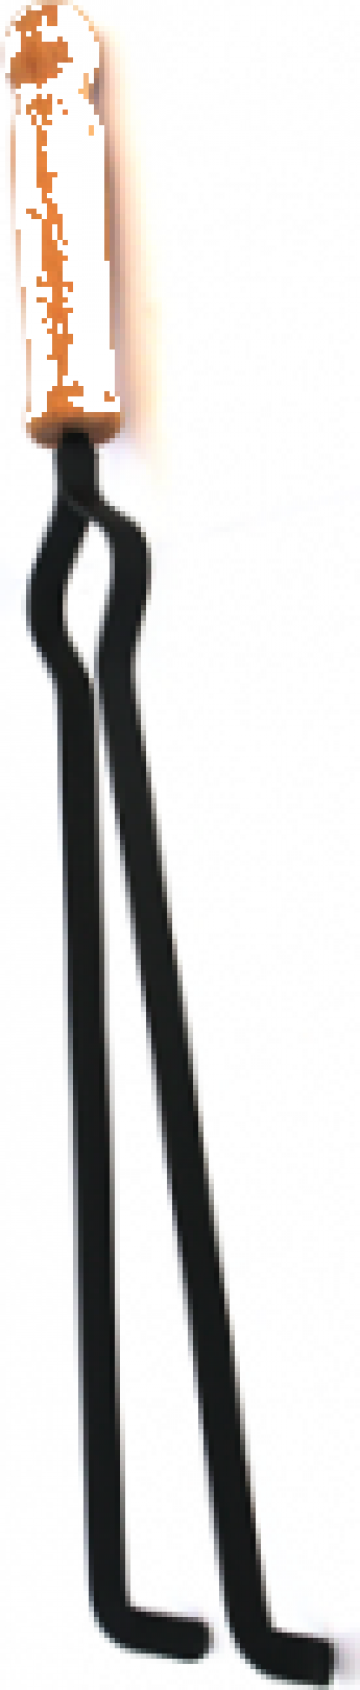 Vatrai mare 58cm de la Basarom Com